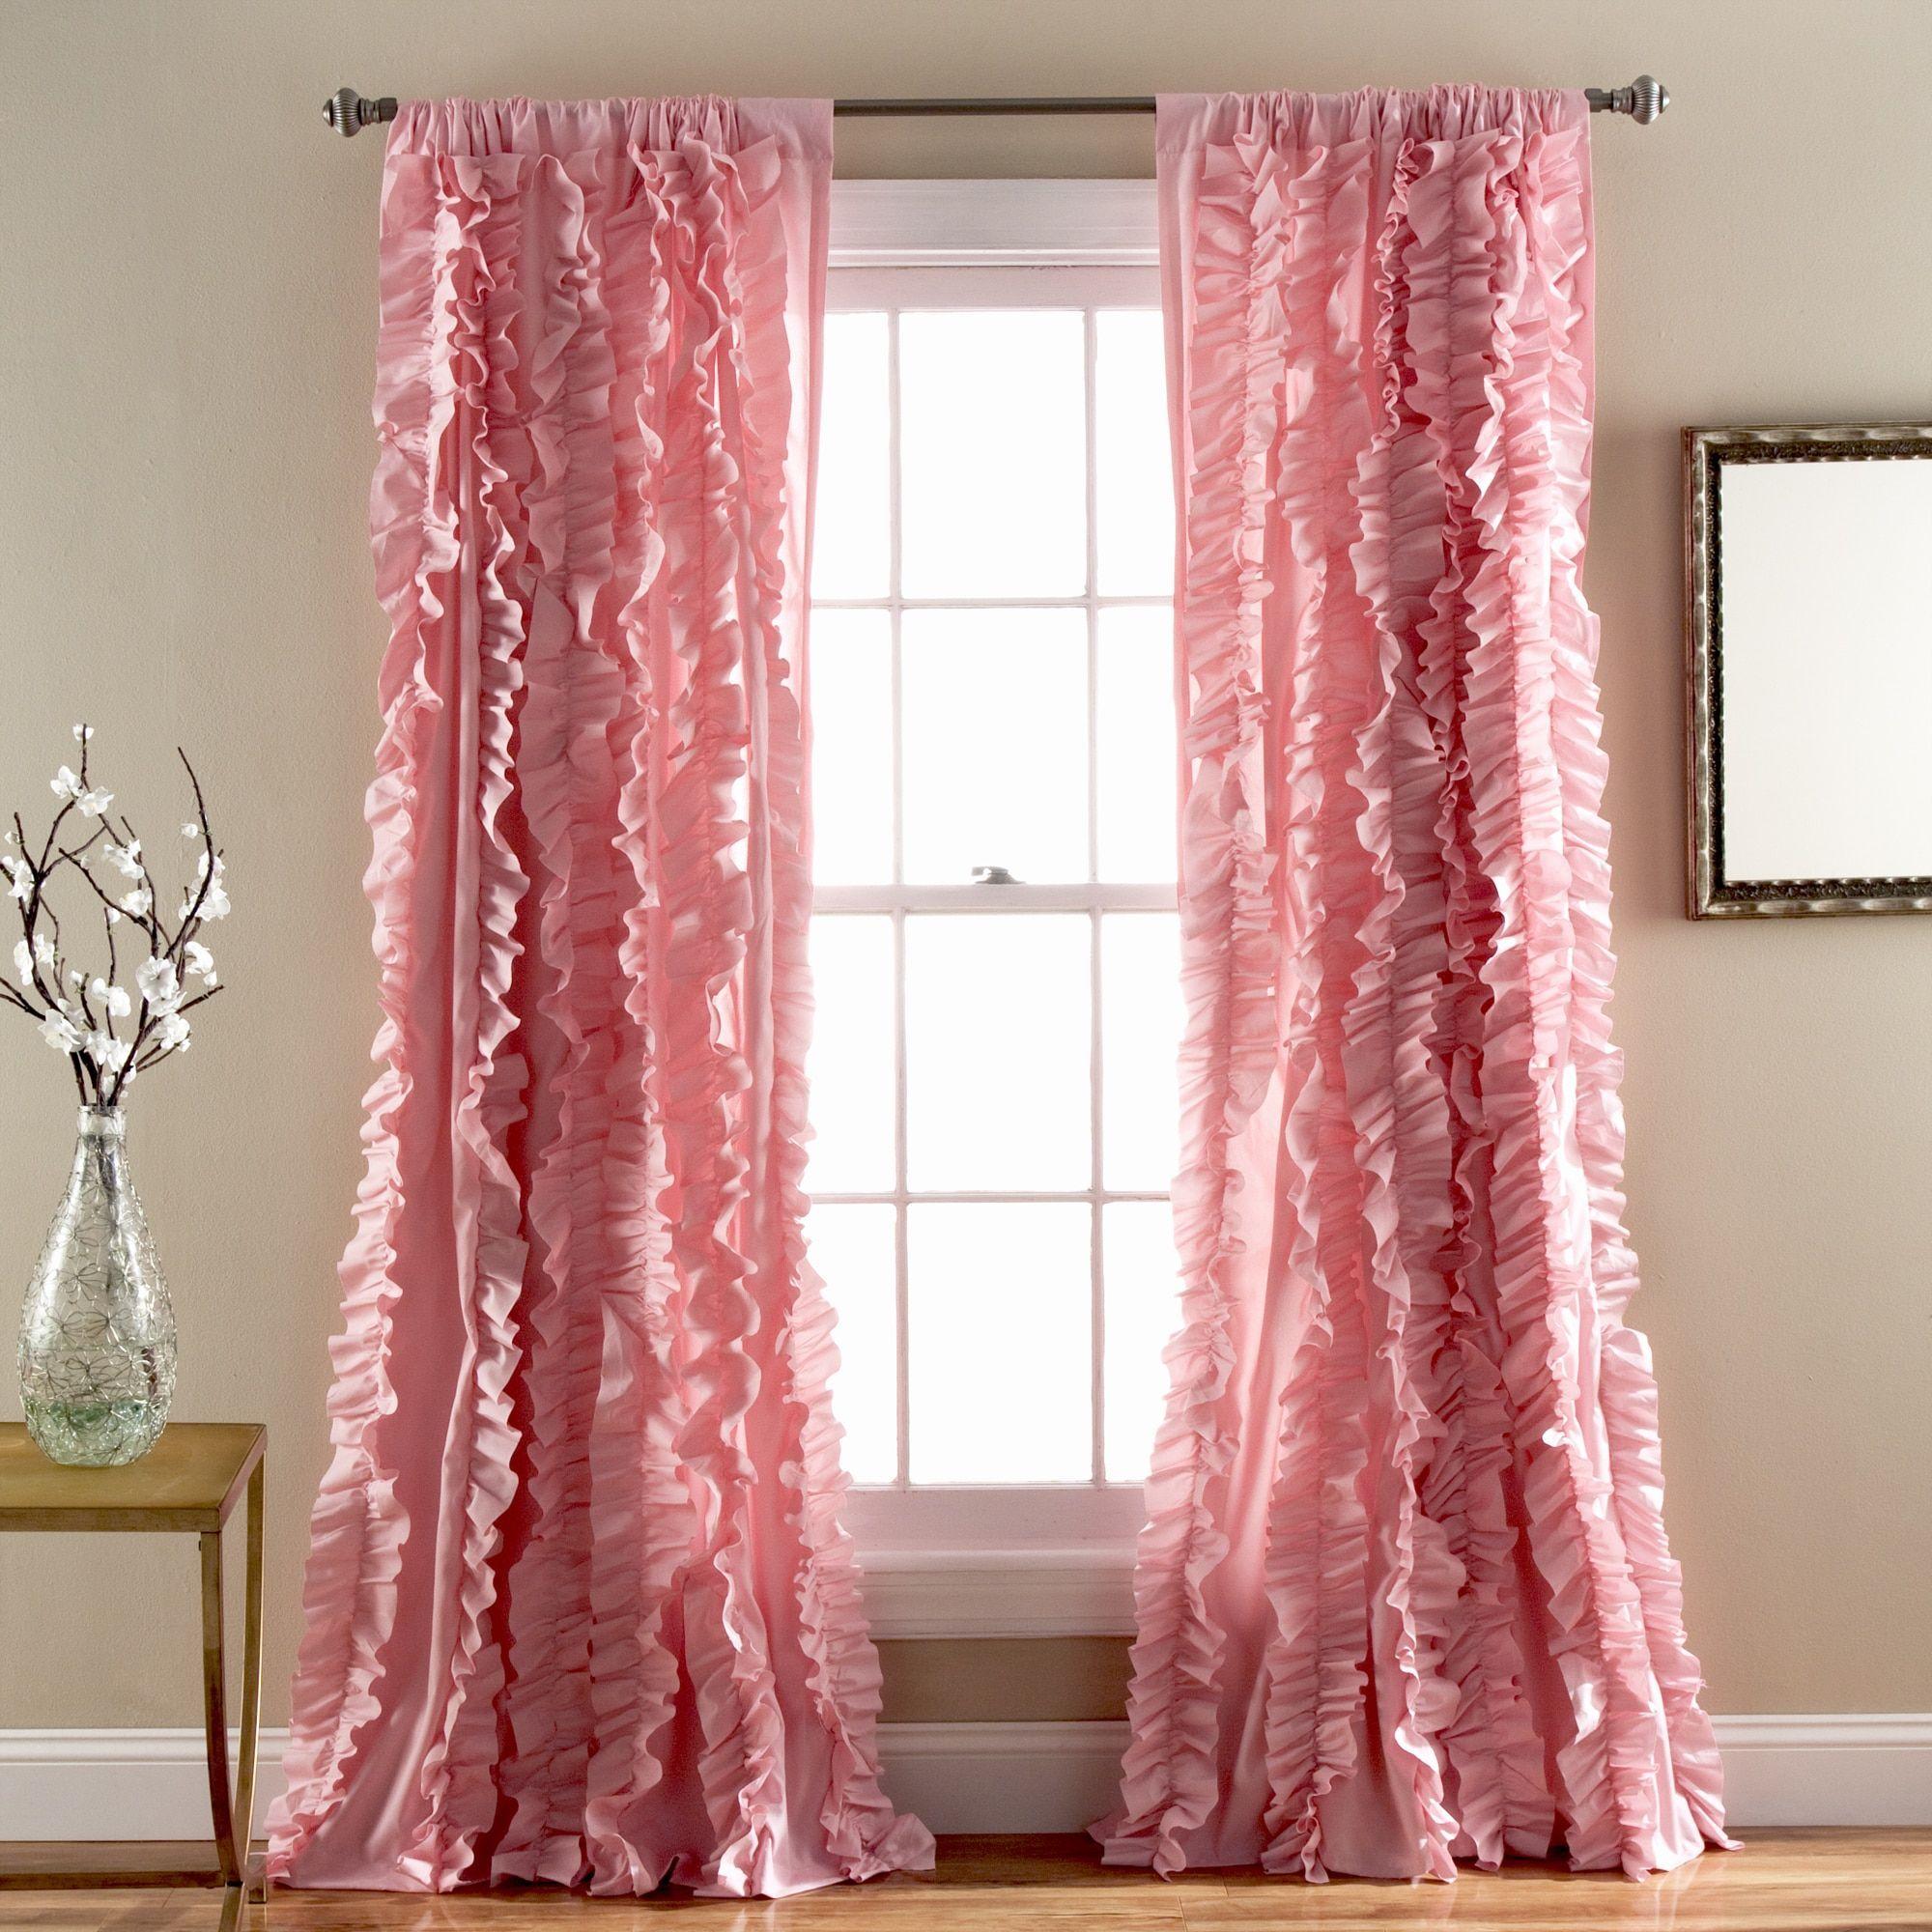 Lush Decor Riley Window Curtain Panel 84 x 54 Blush